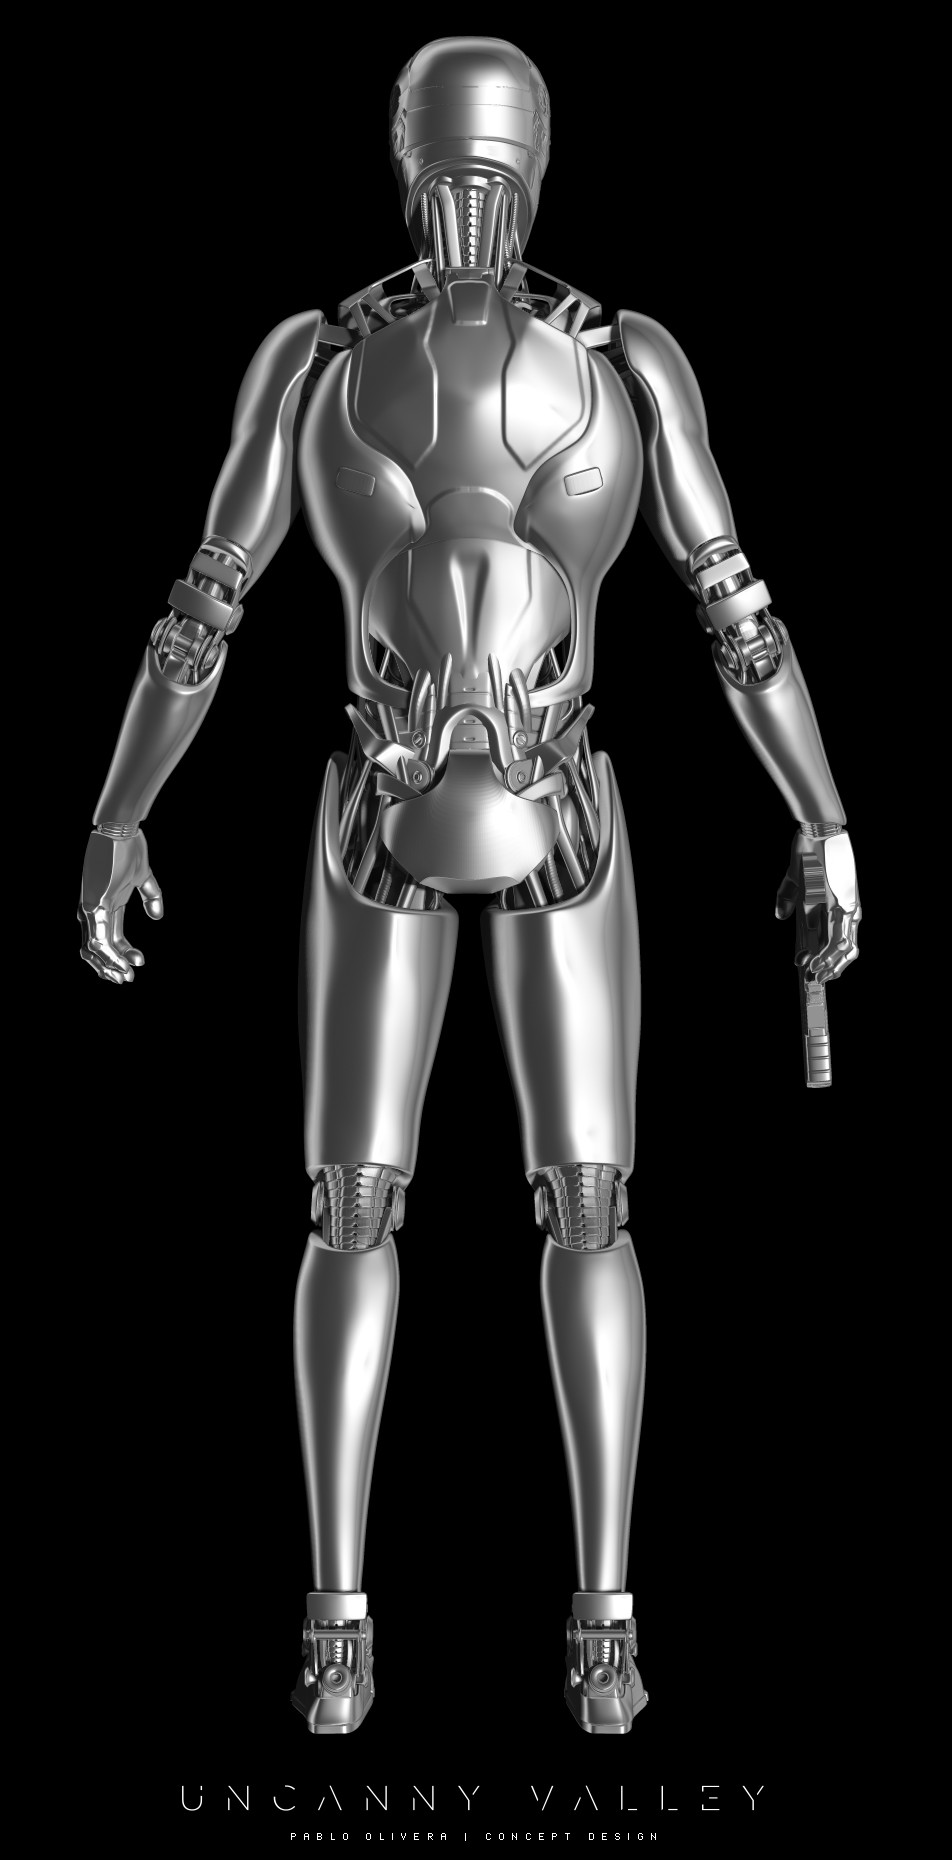 Pablo olivera uncanny valley character design robot 05